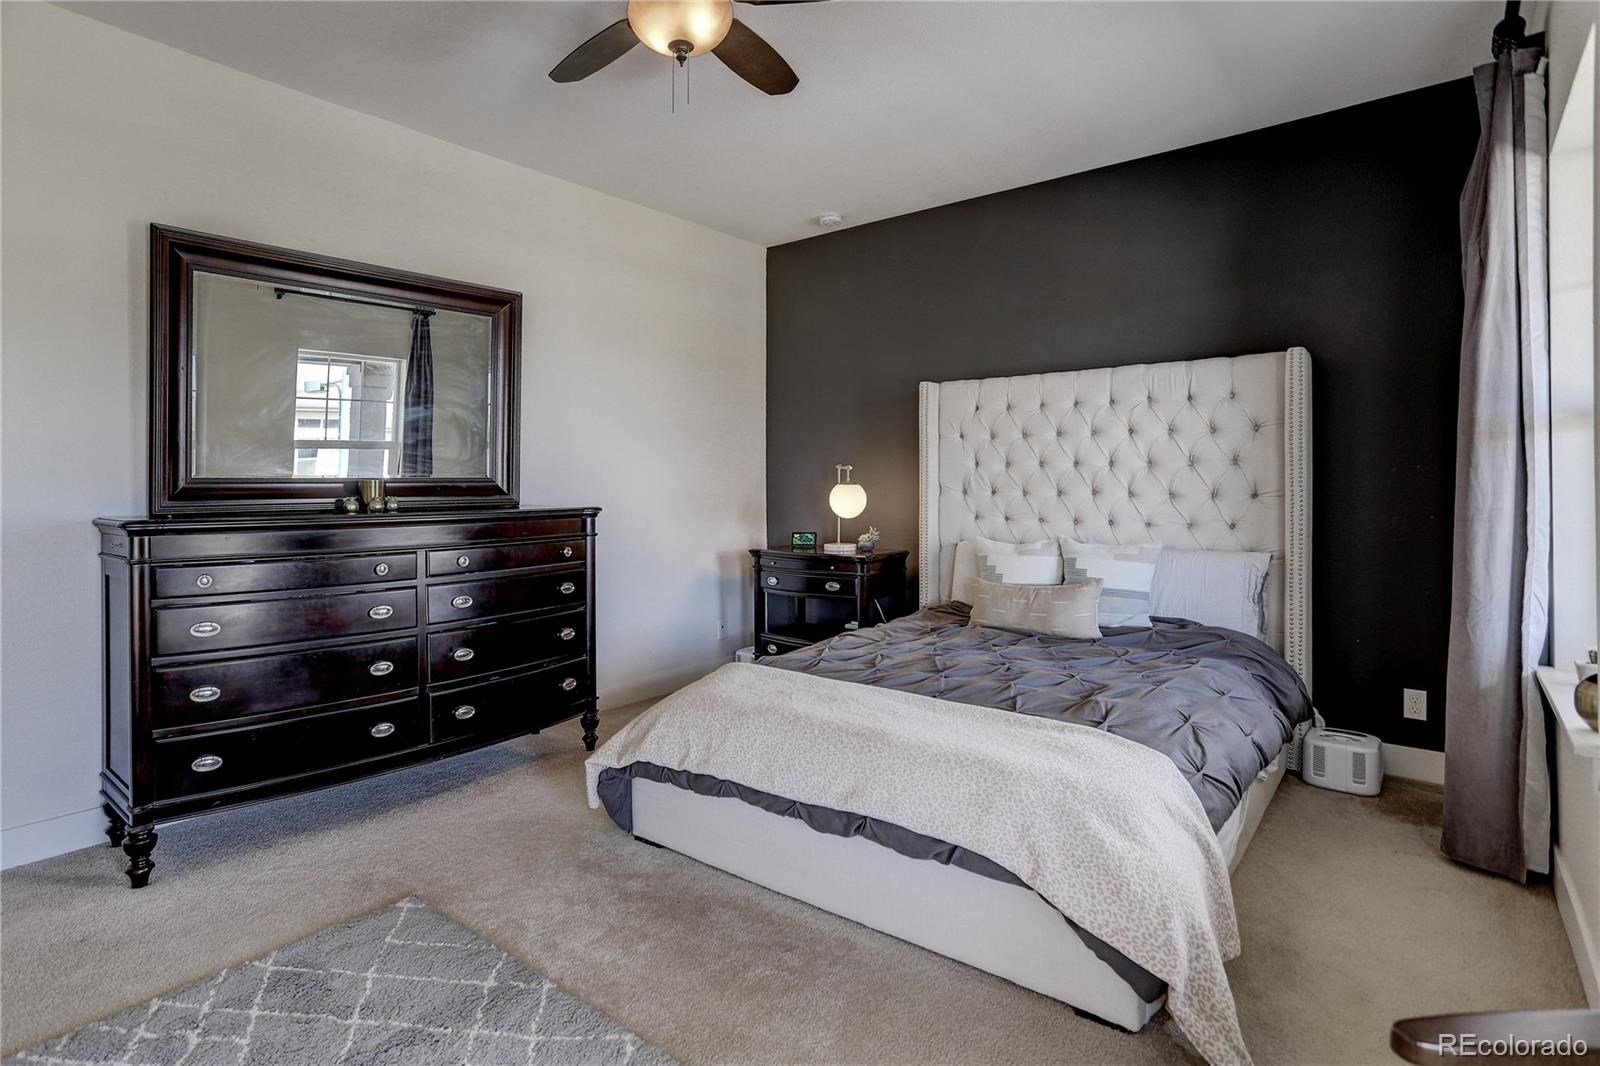 MLS# 6992885 - 18 - 8084 E 31st Avenue, Denver, CO 80238